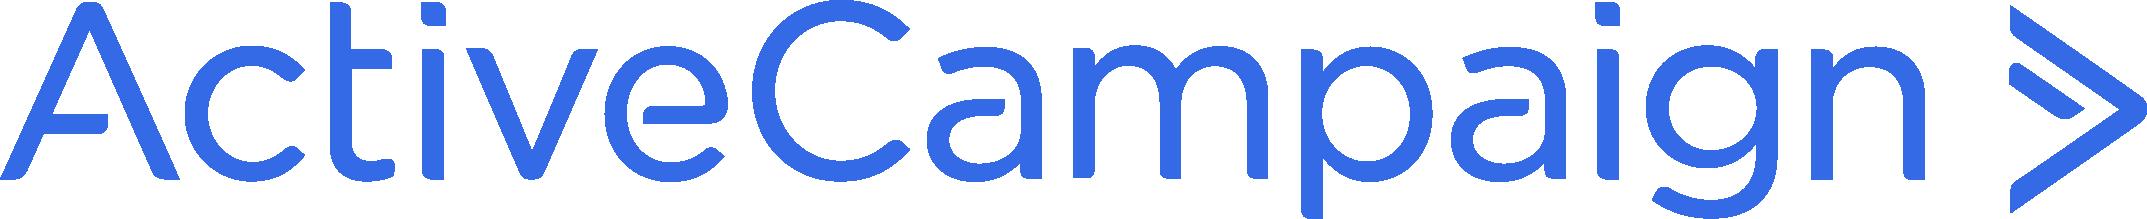 active campaign logo review